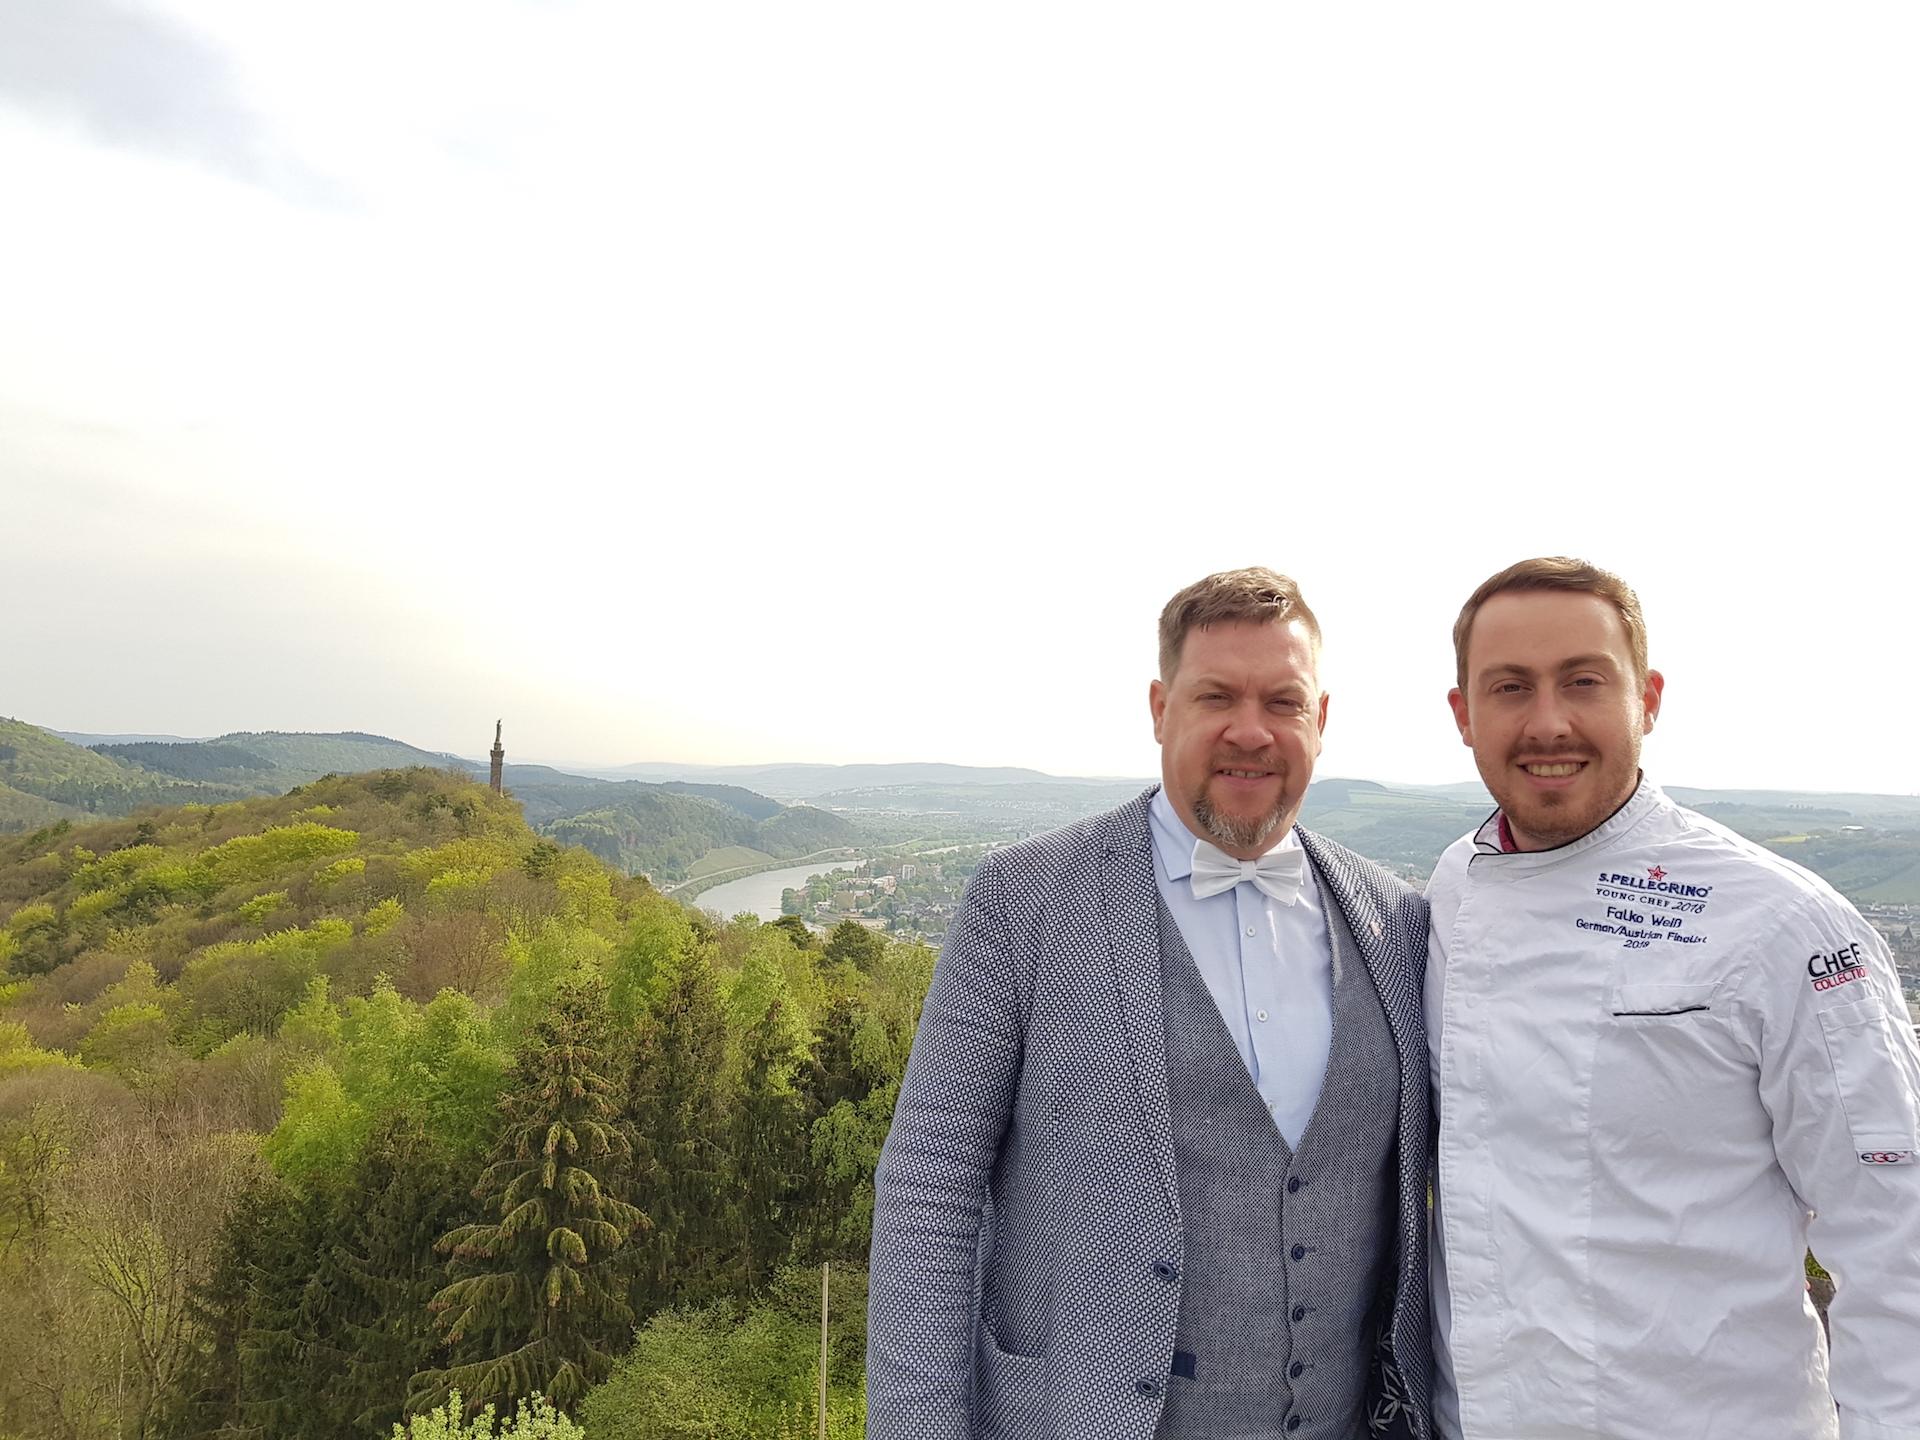 Falko Weiss Ubernimmt Das Restaurant Zur Schonen Aussicht Trier